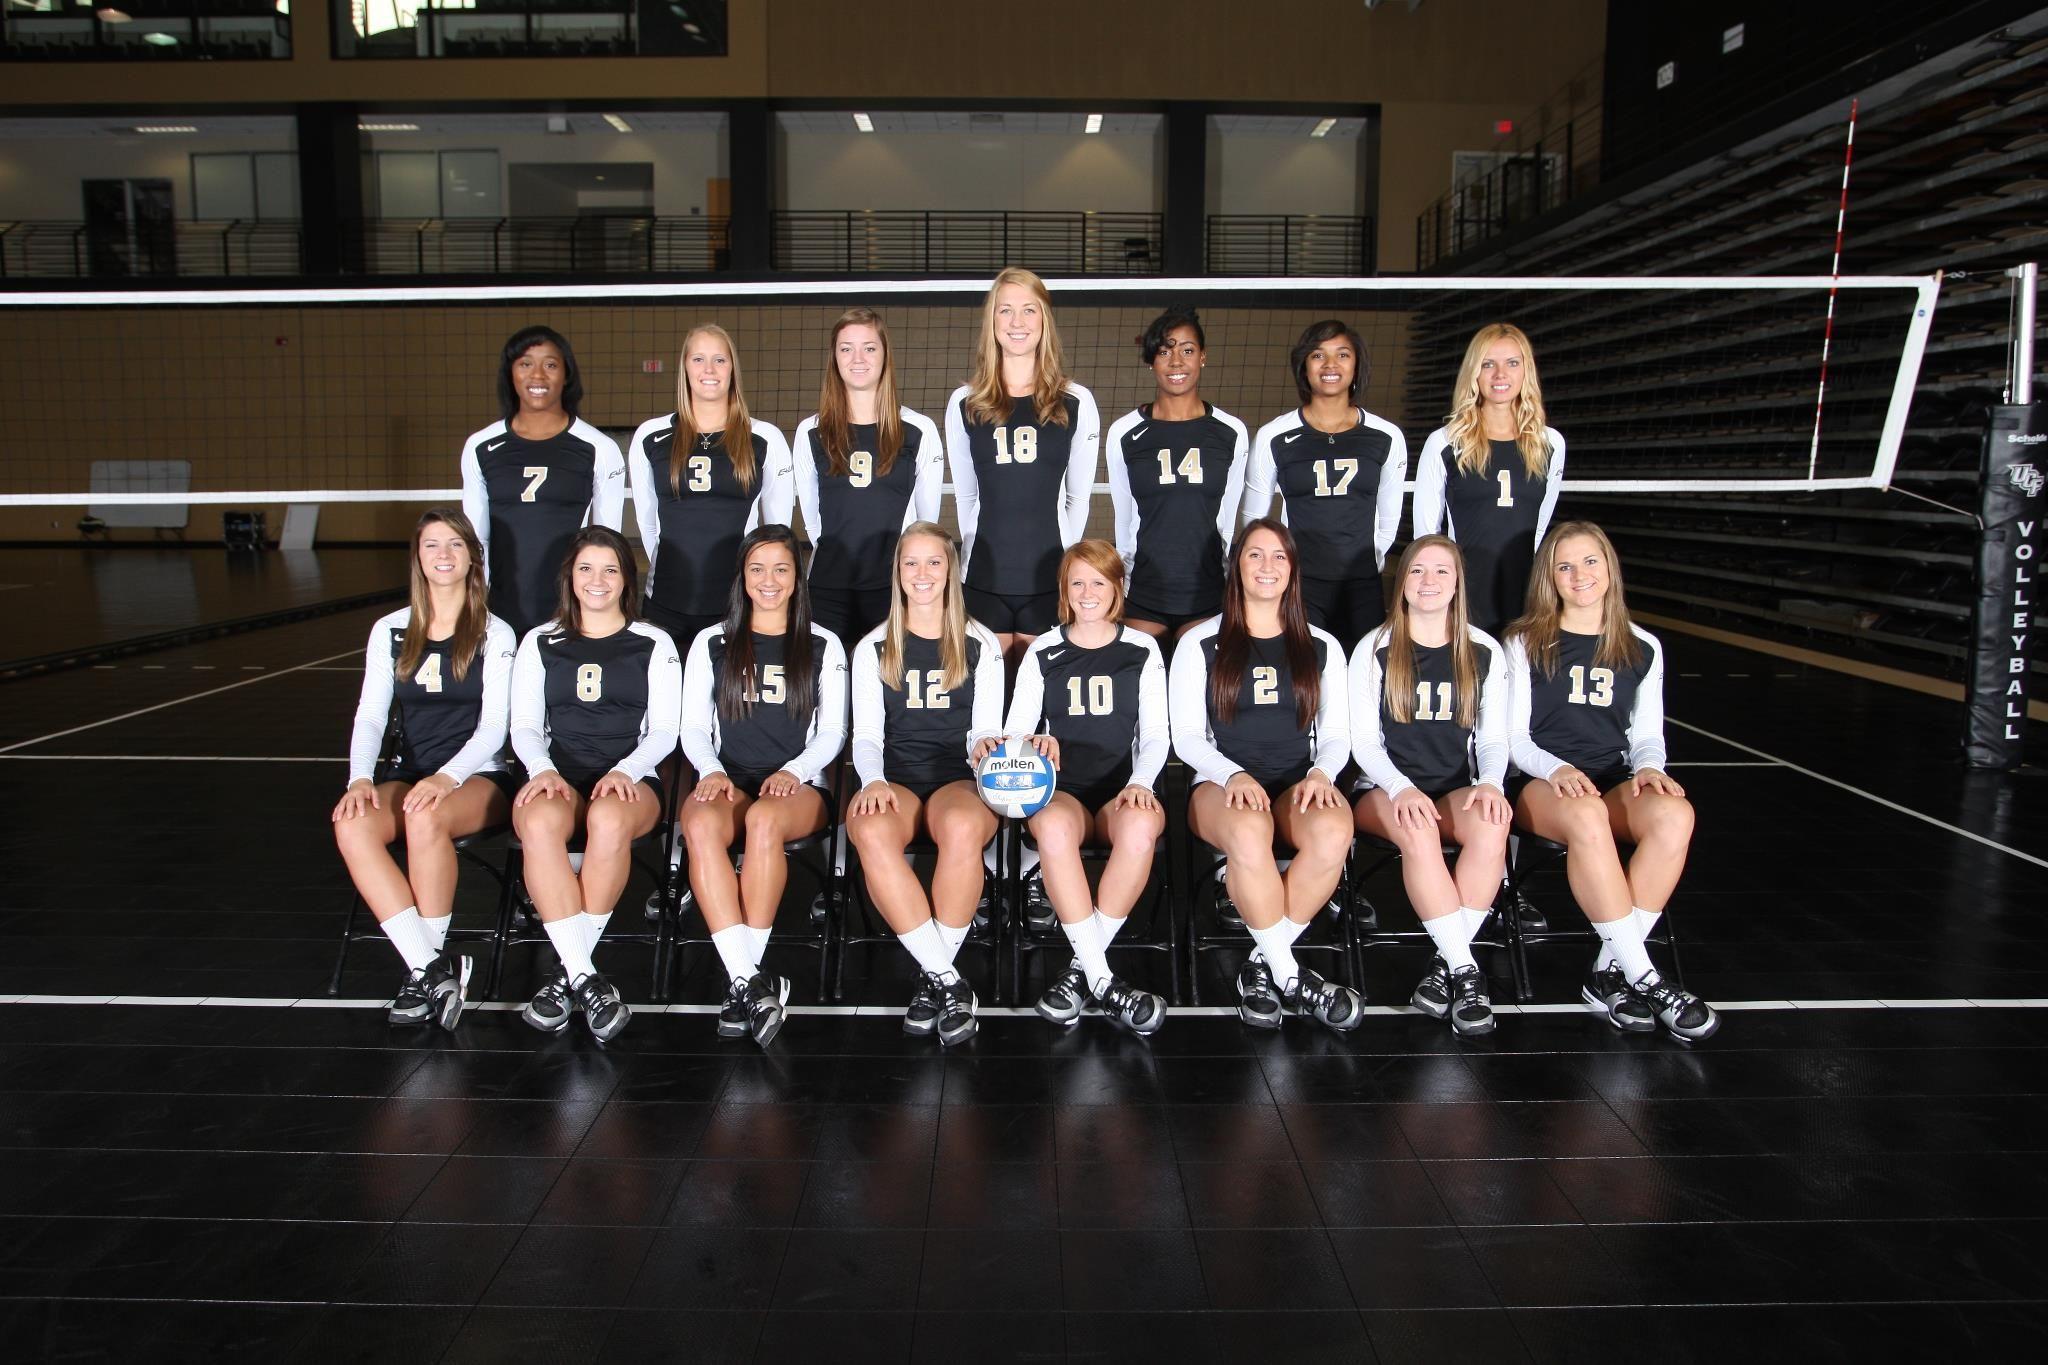 2012 Ucf Volleyball Team Women Volleyball Volleyball Team Volleyball